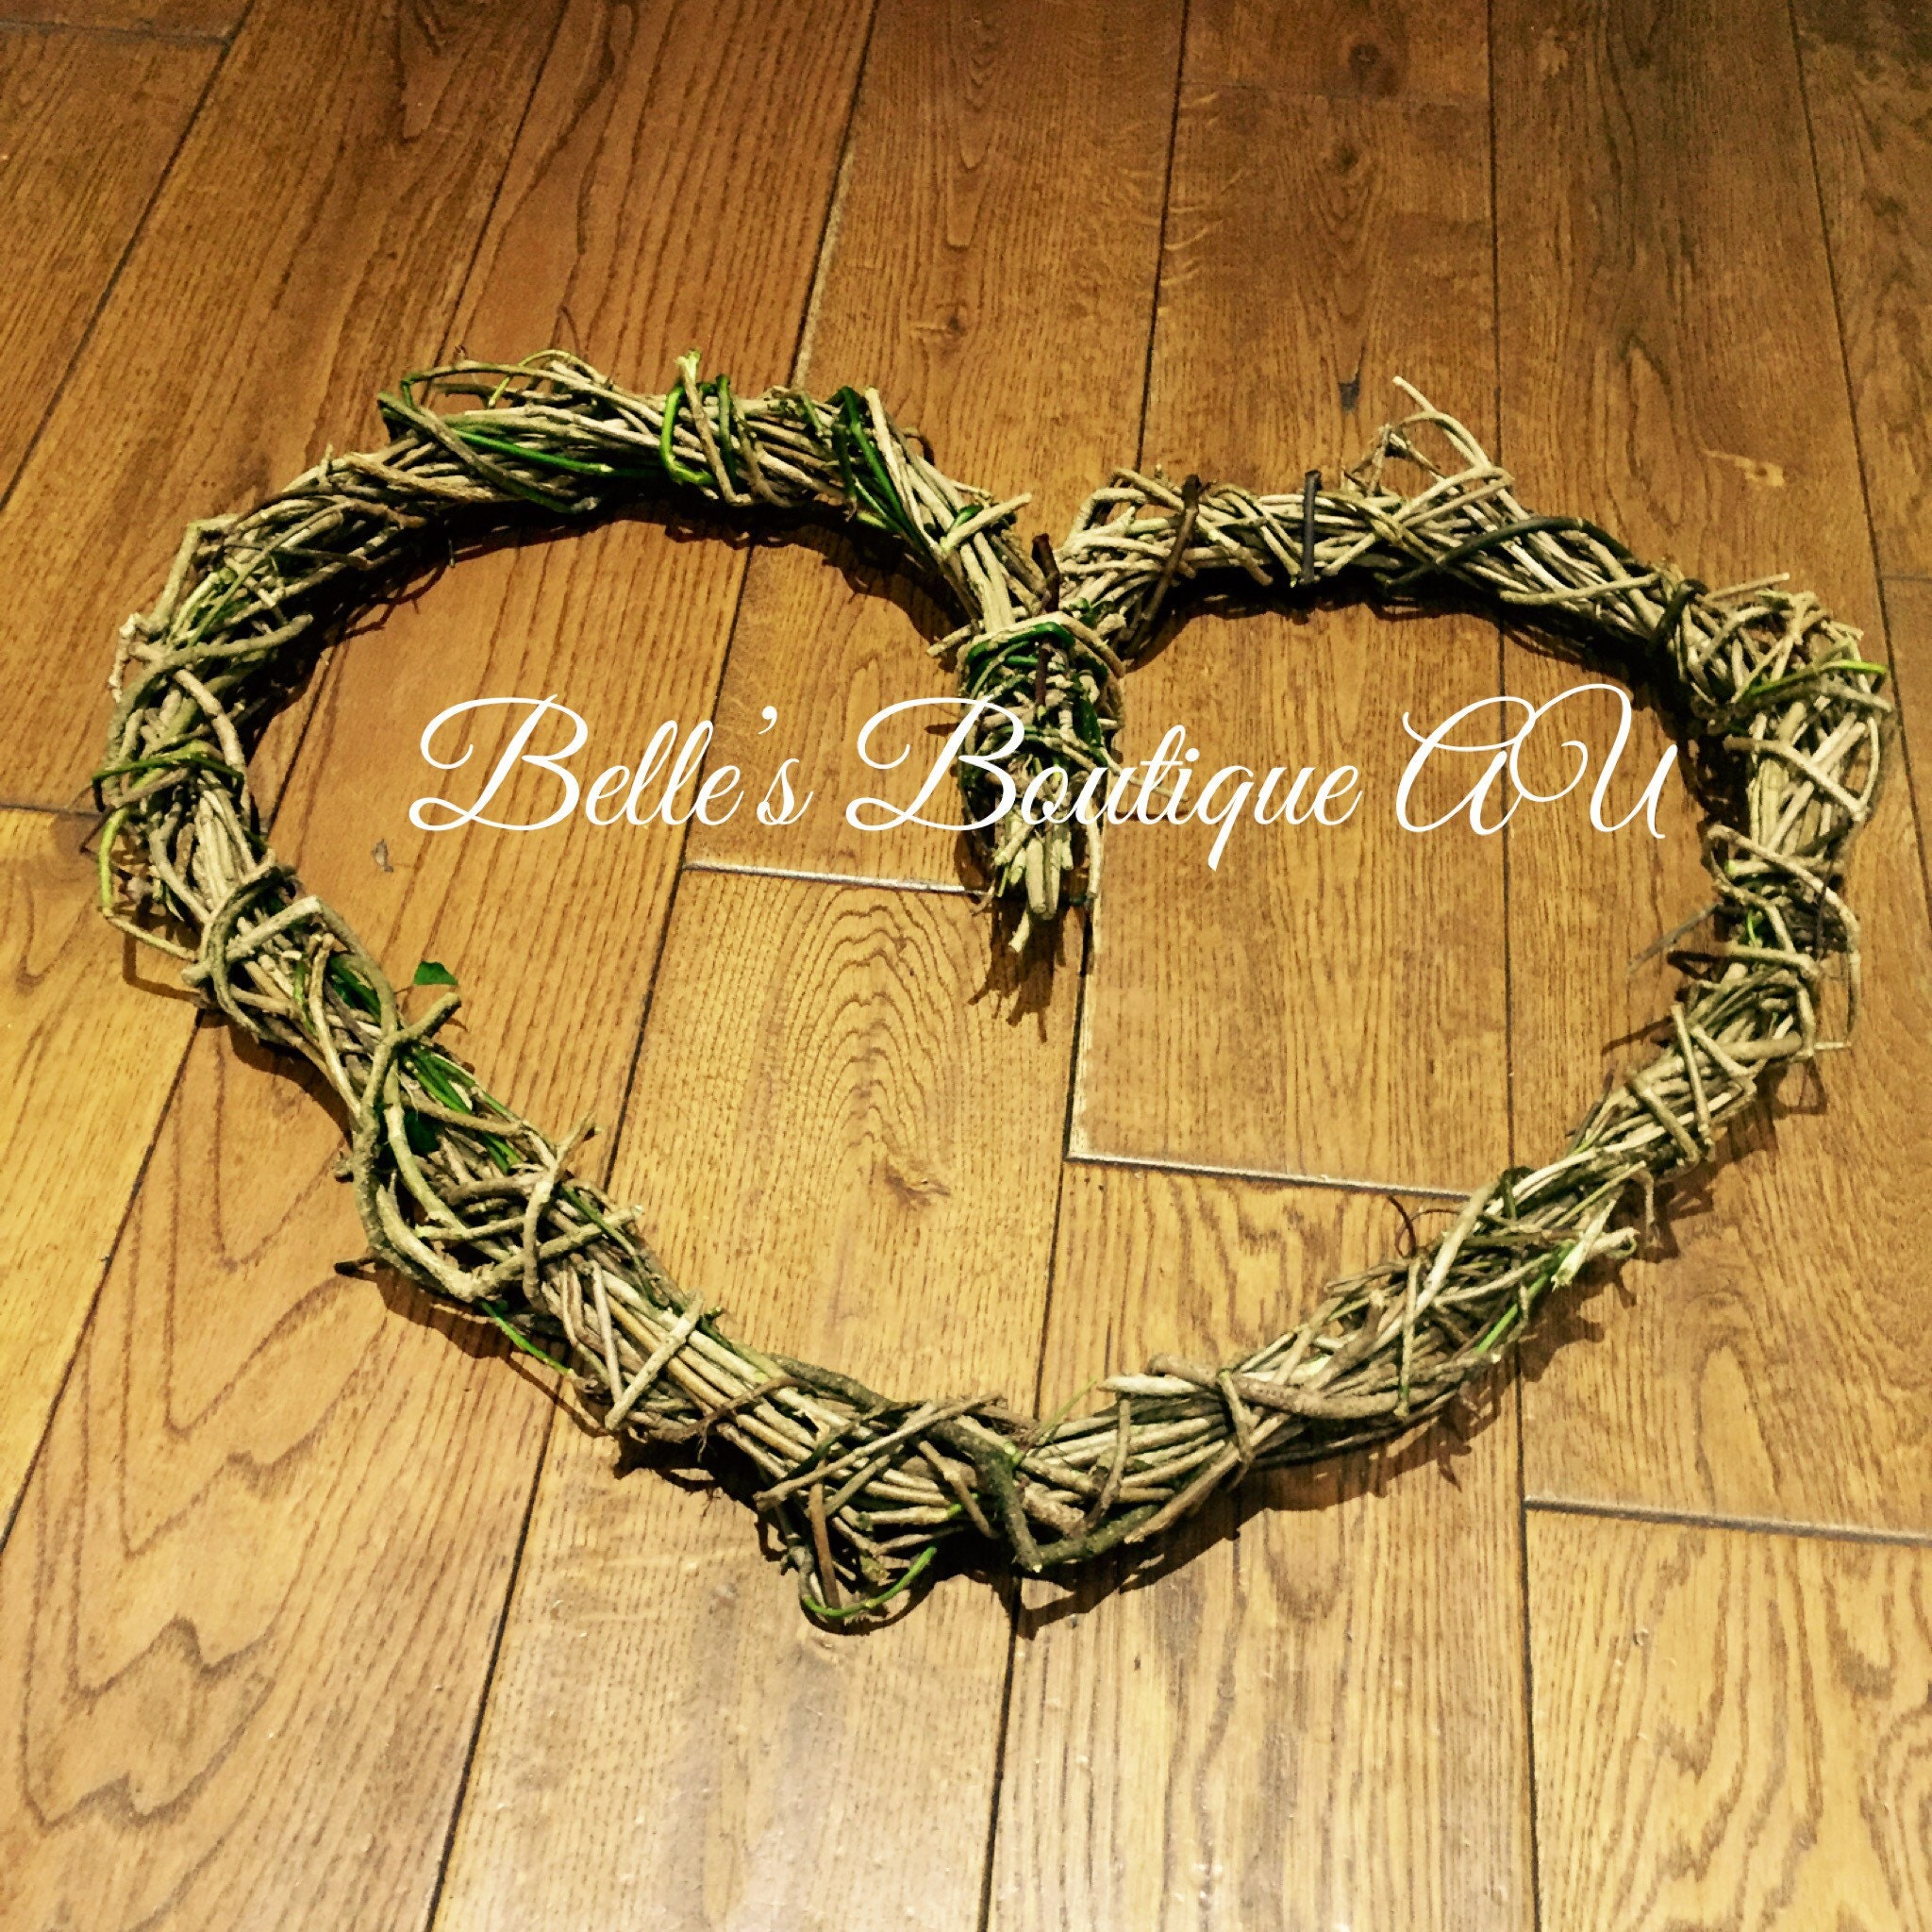 Large Love Heart Wreath Rustic Wedding Decor Rustic Home